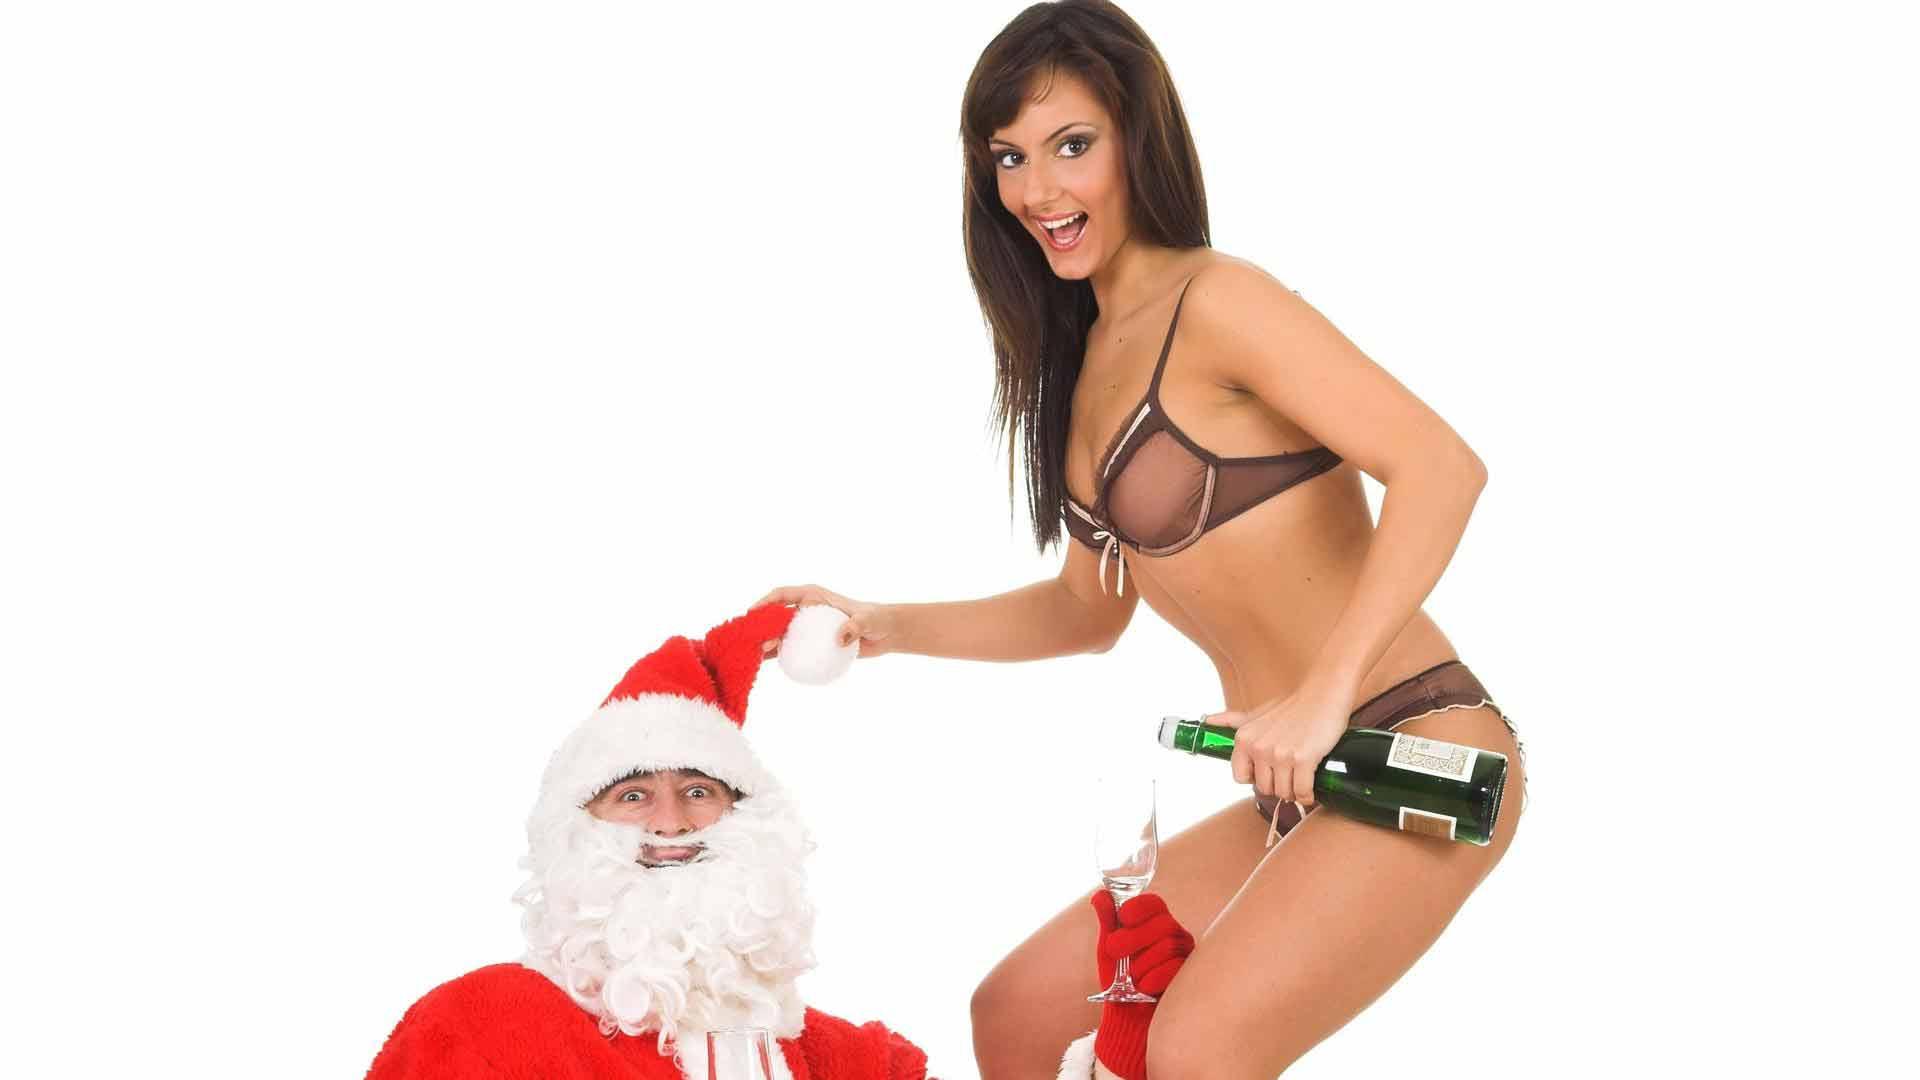 Картинки новогодние секси дед мороз для телефона